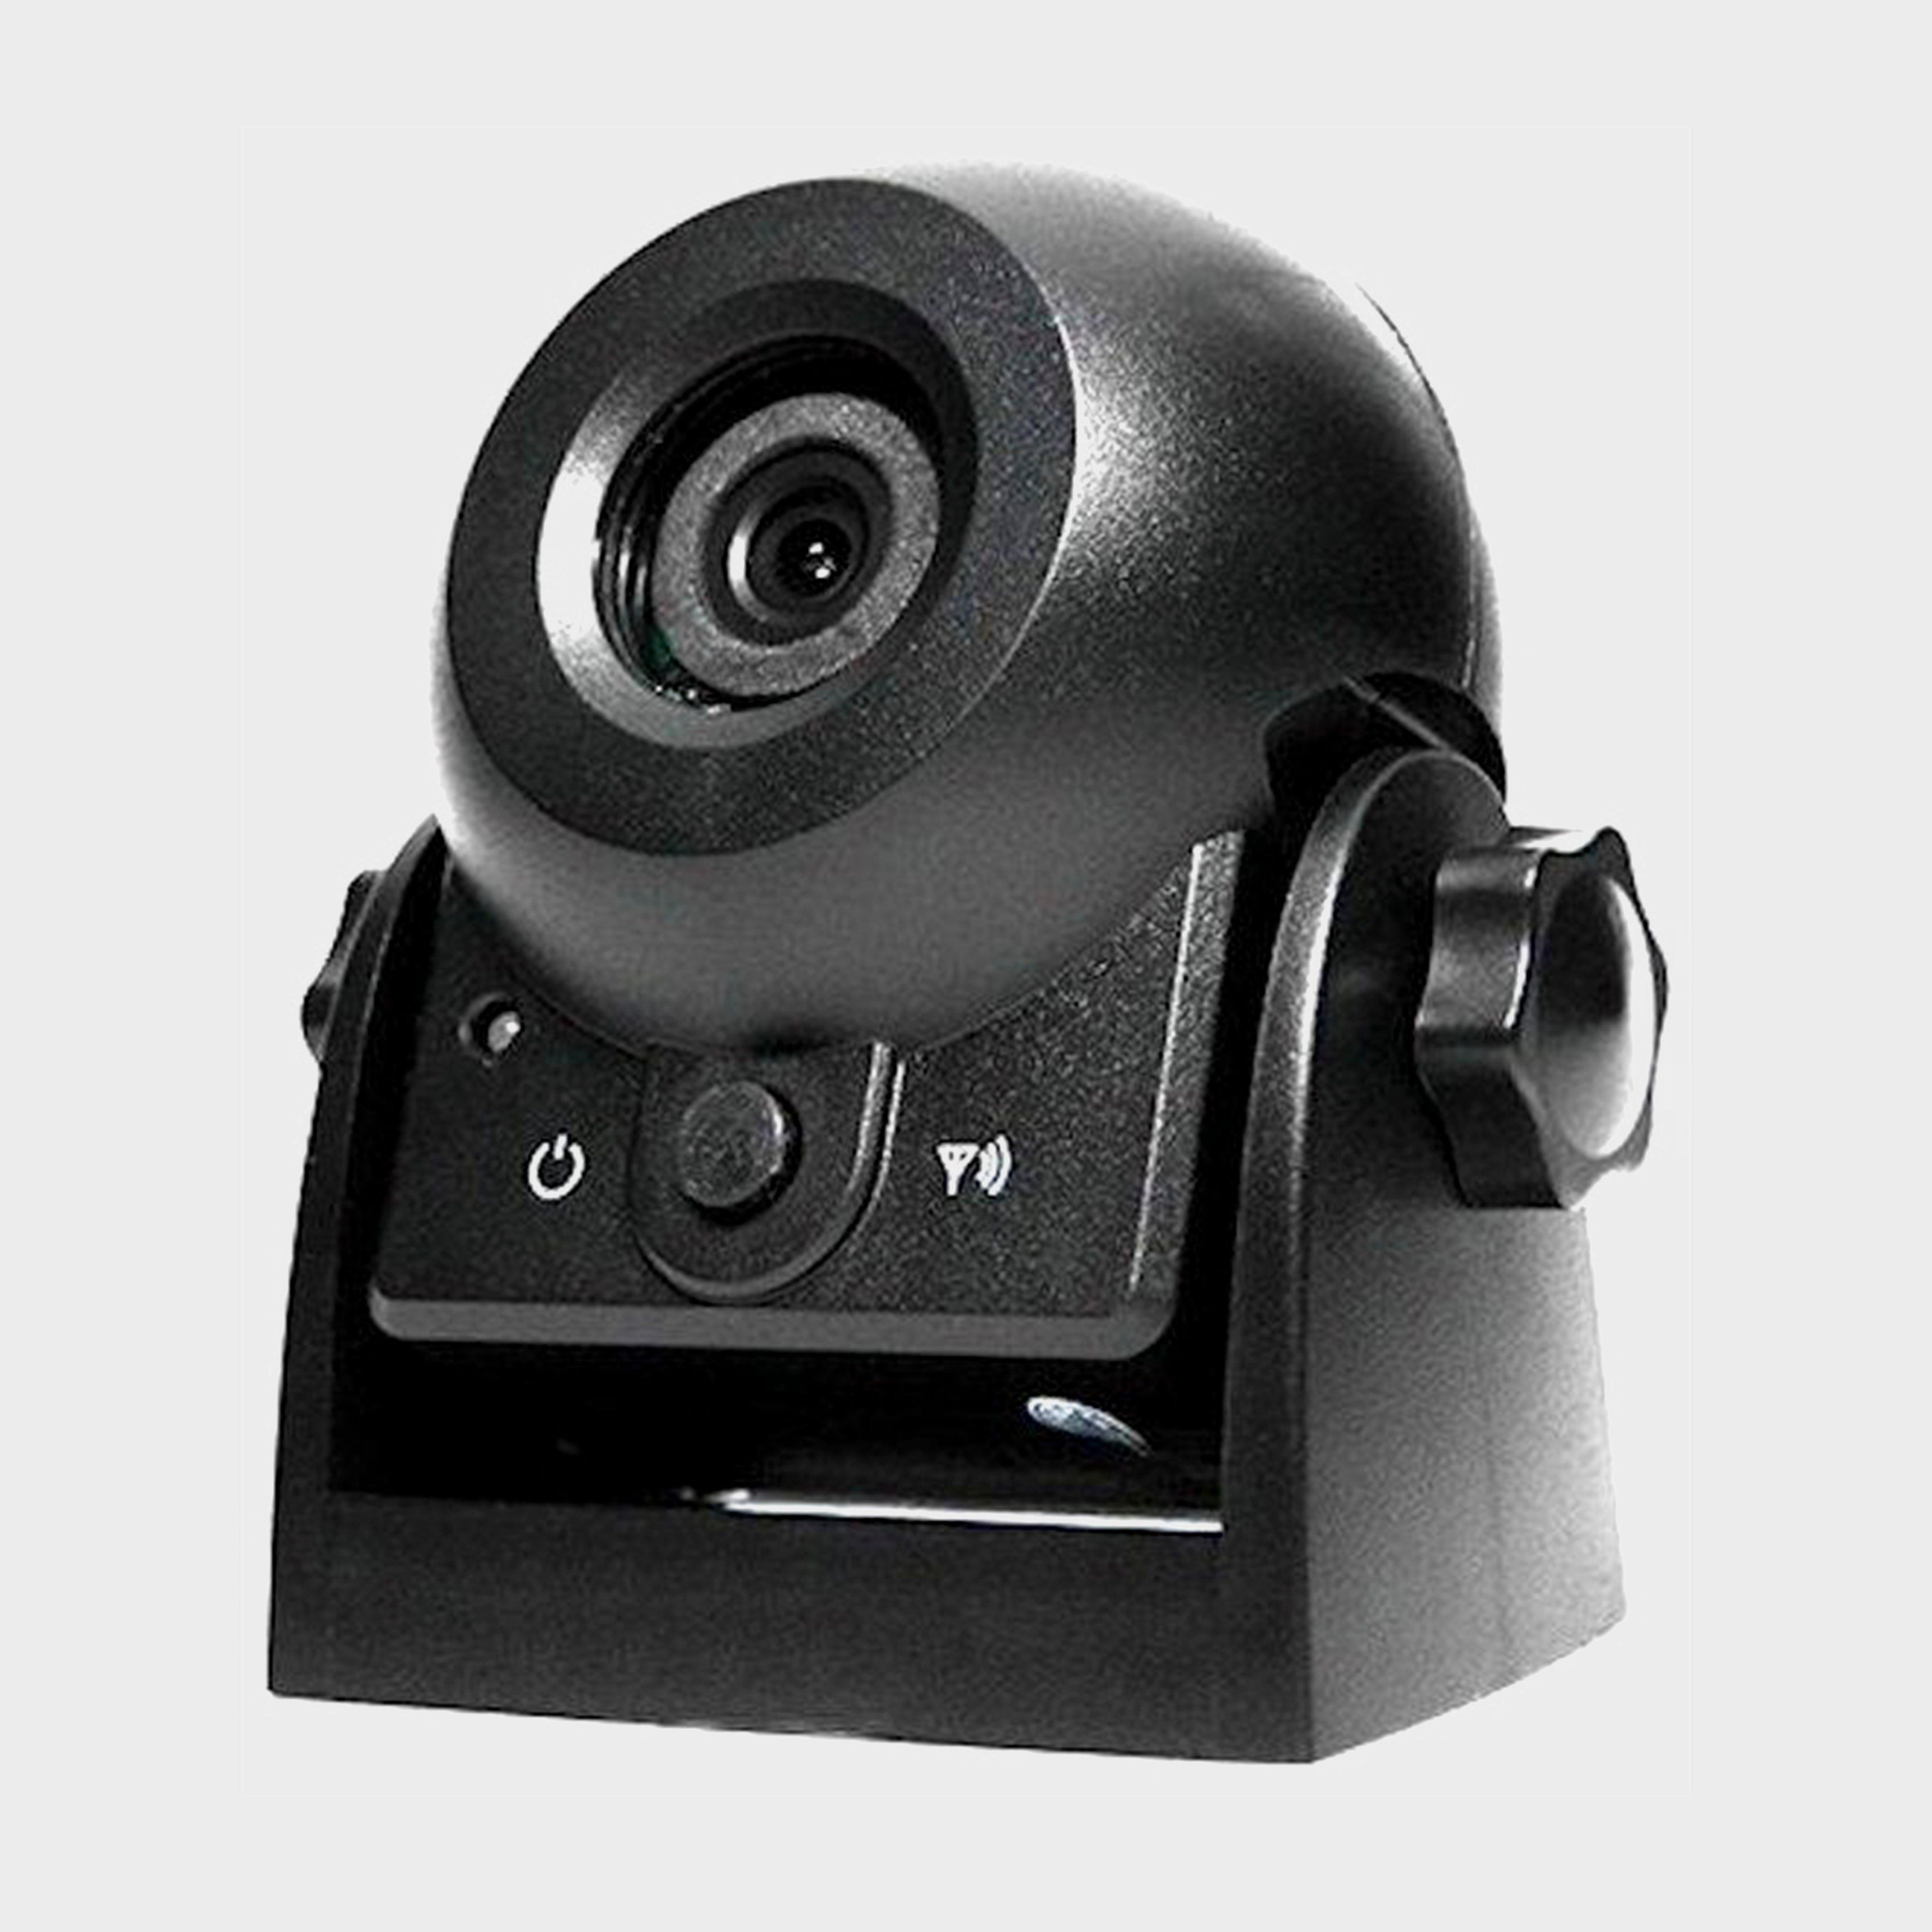 Falcon Wifi Rear View Reversing Camera - Black/Camera, Black